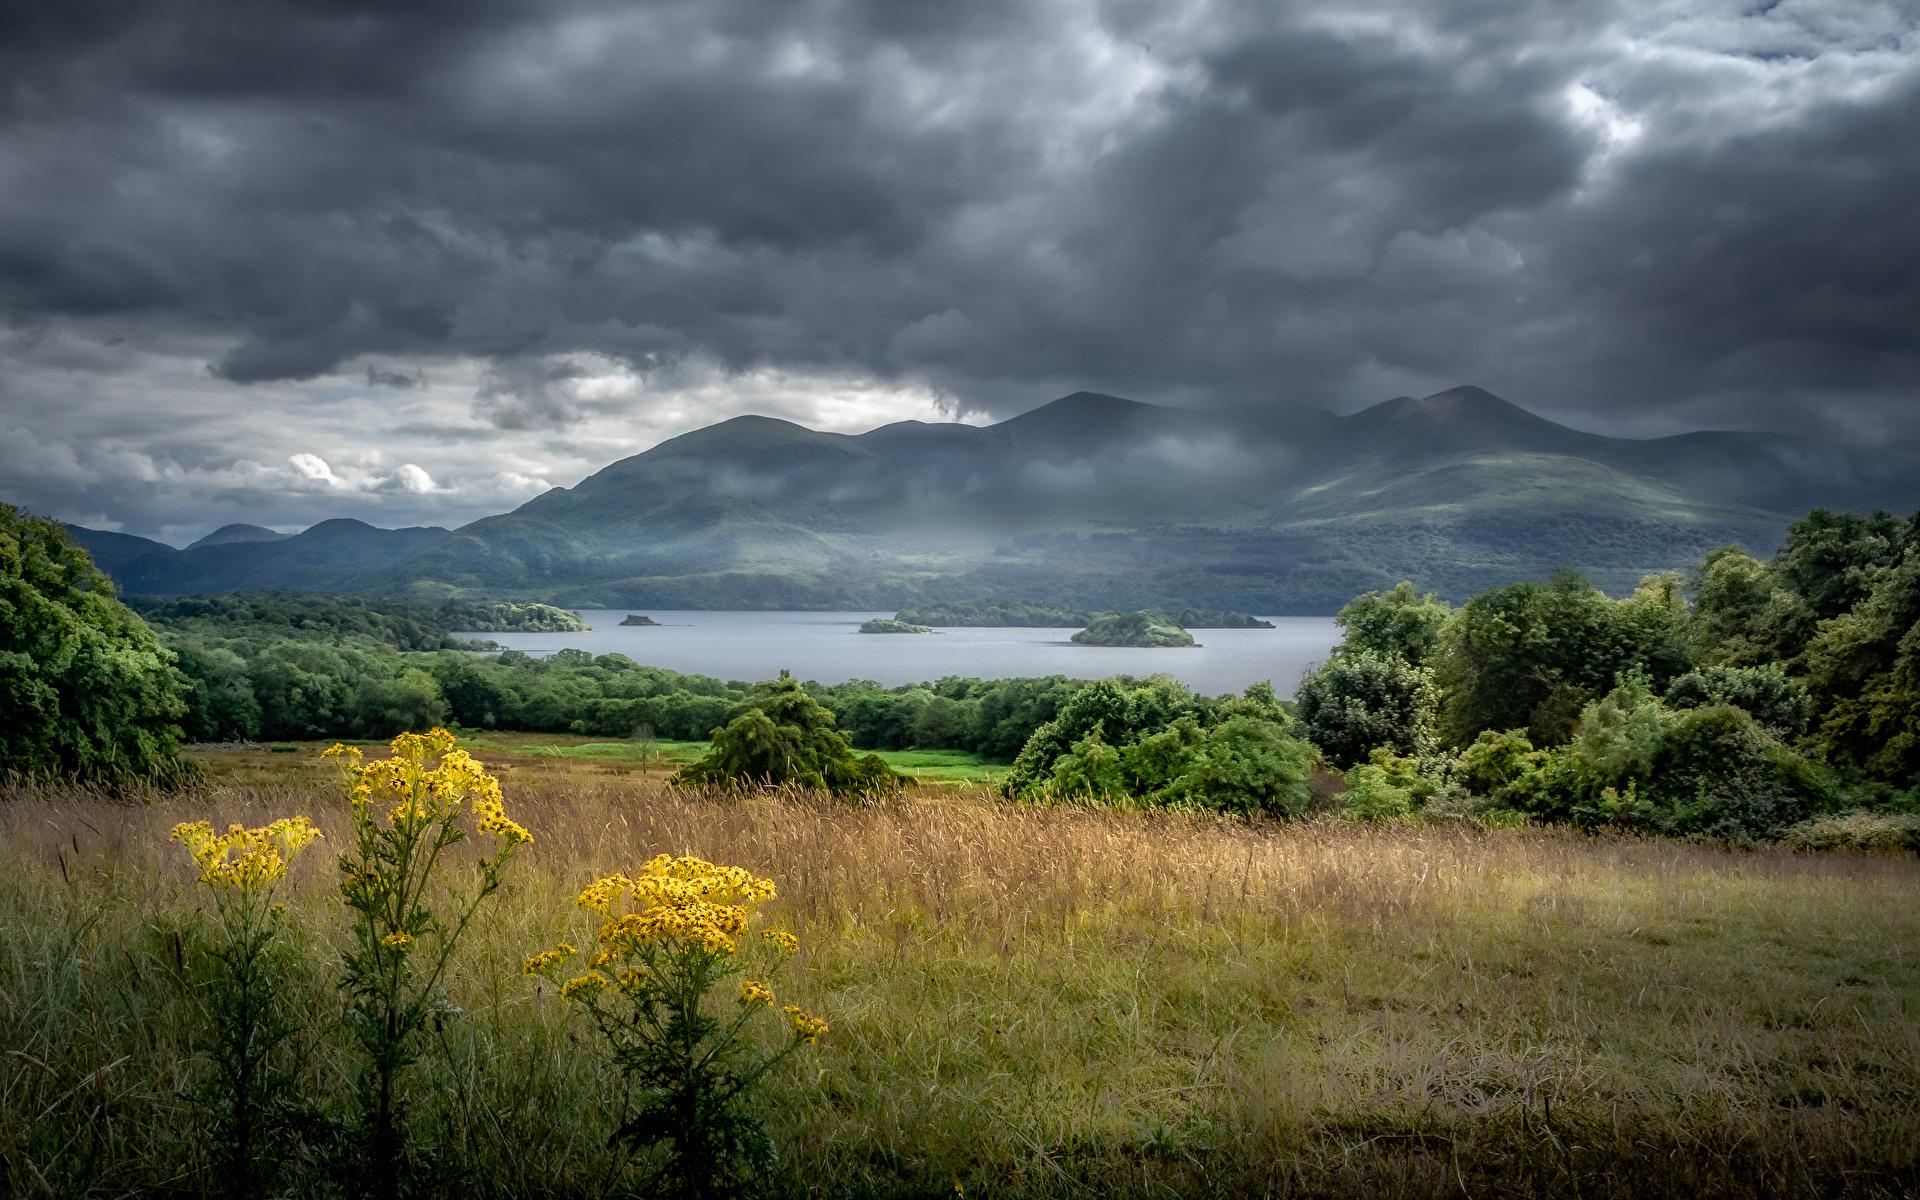 Desktop Wallpapers Ireland Killarney, Kerry storm cloud Nature Mountains Lake Trees 1920x1200 Thundercloud mountain